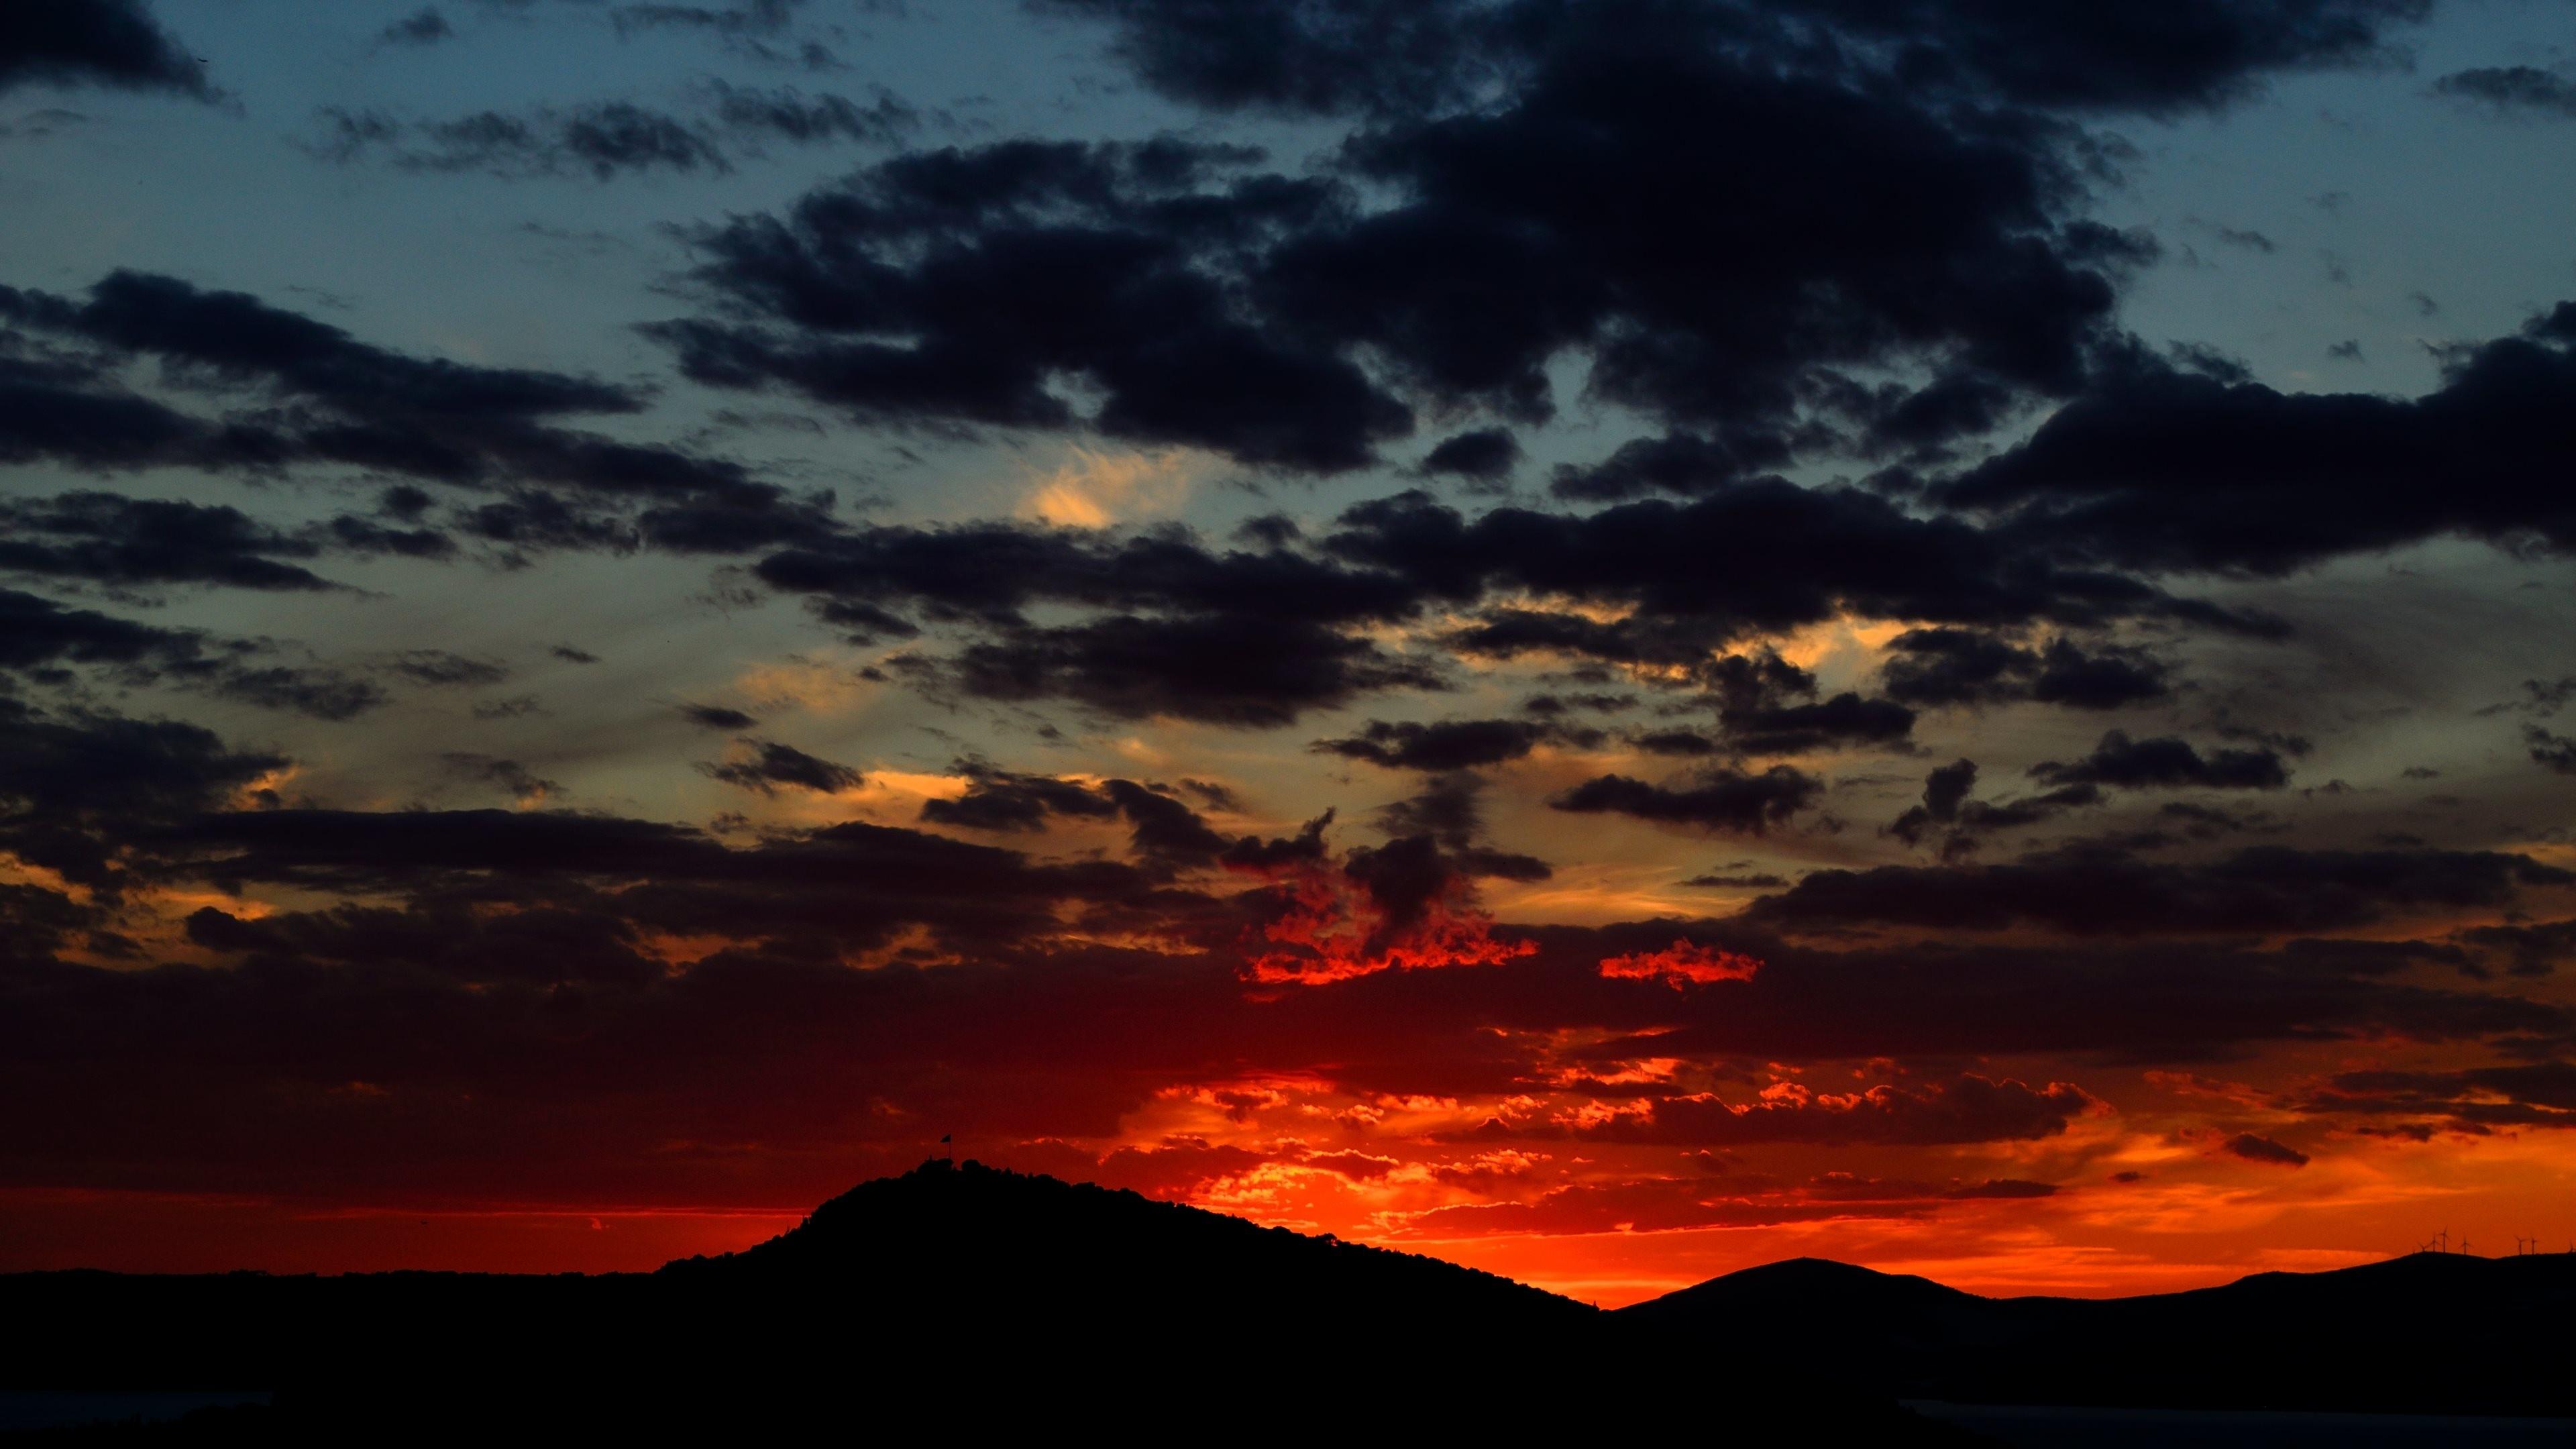 Wallpaper: Late Summer sunset colors. Ultra HD 4K 3840×2160